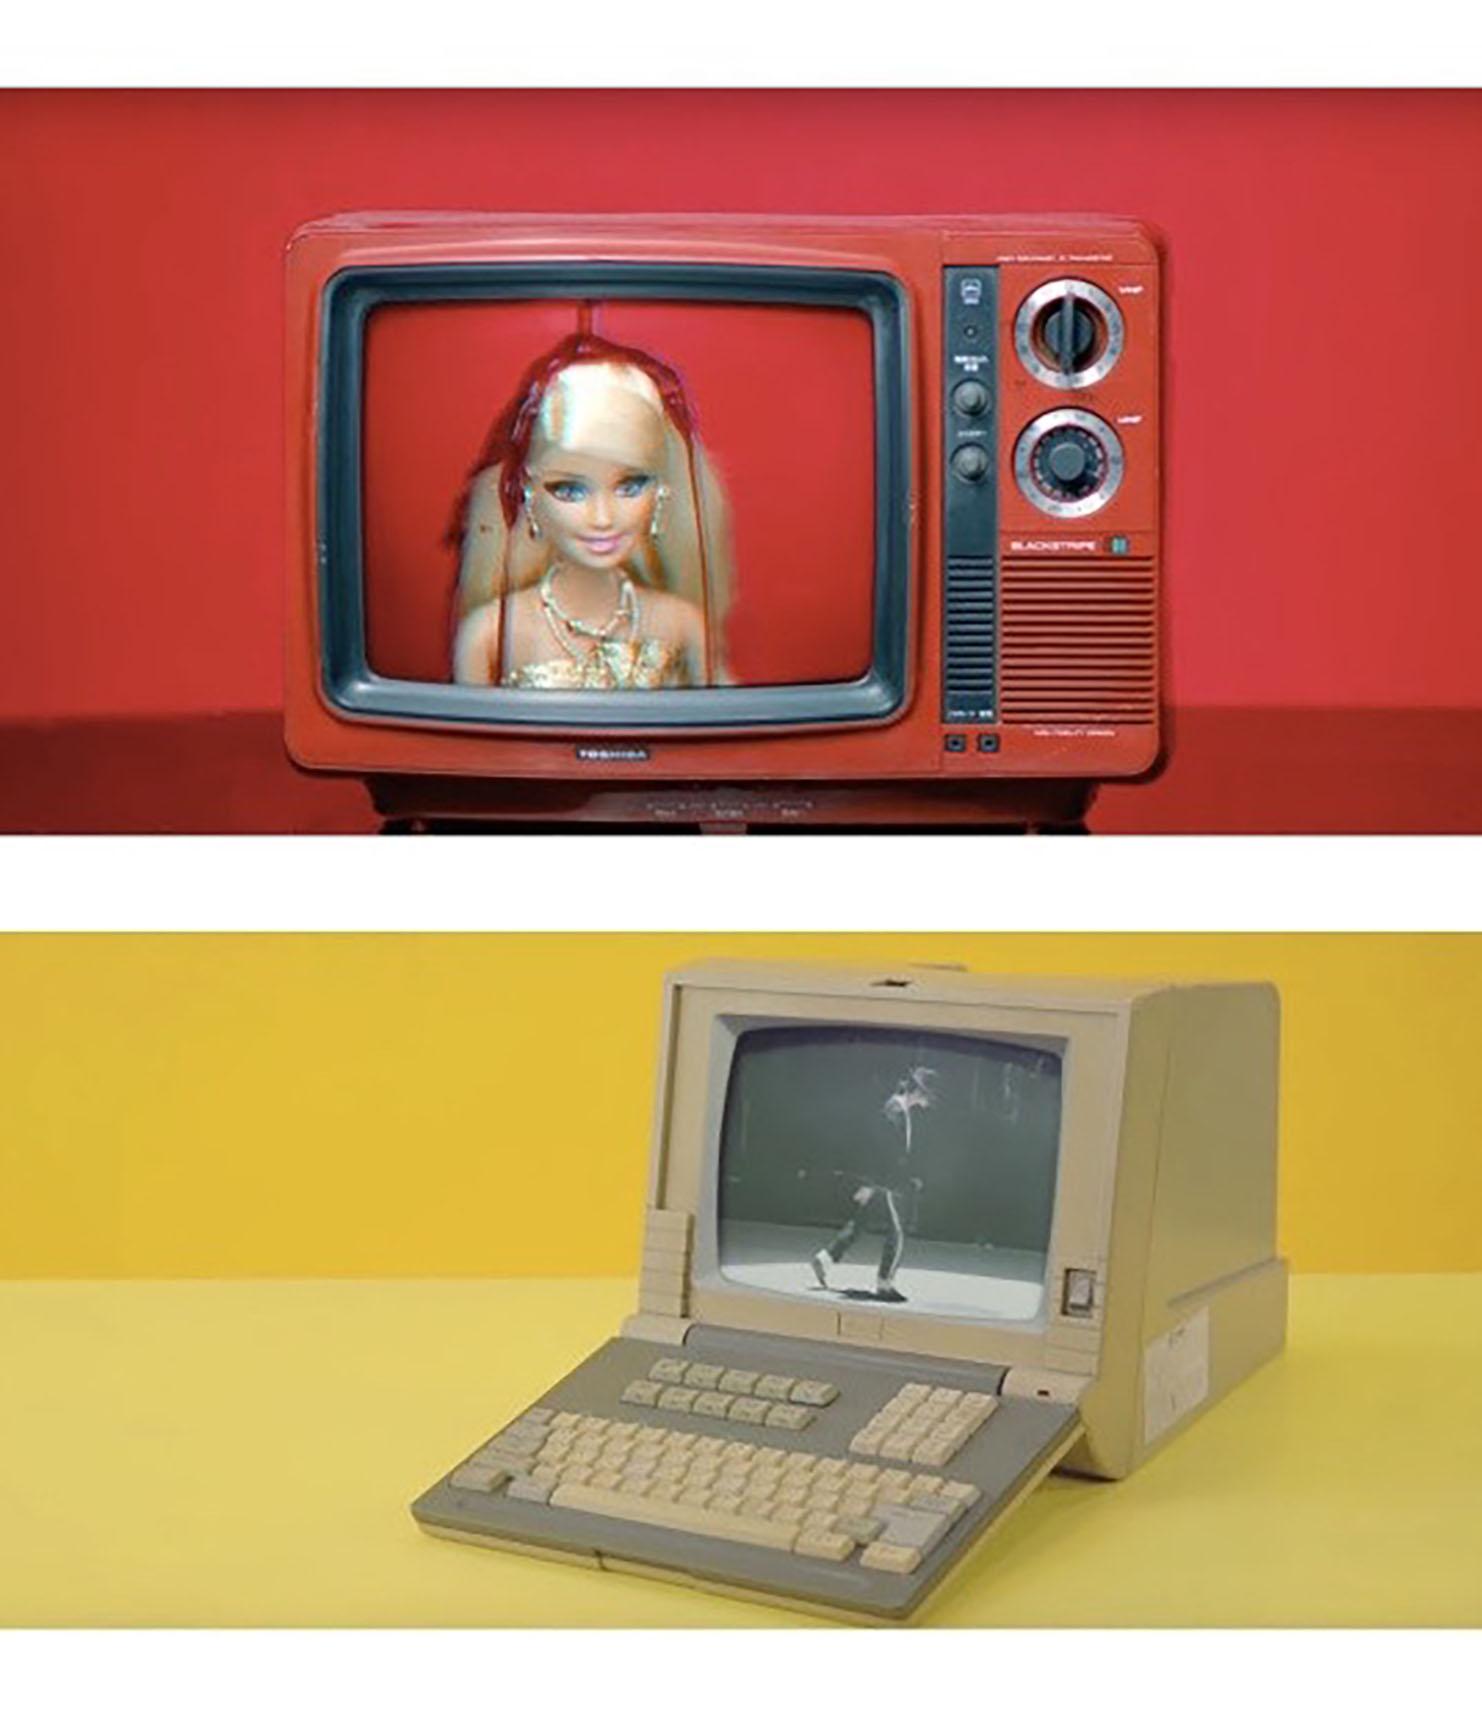 BarbieJackson